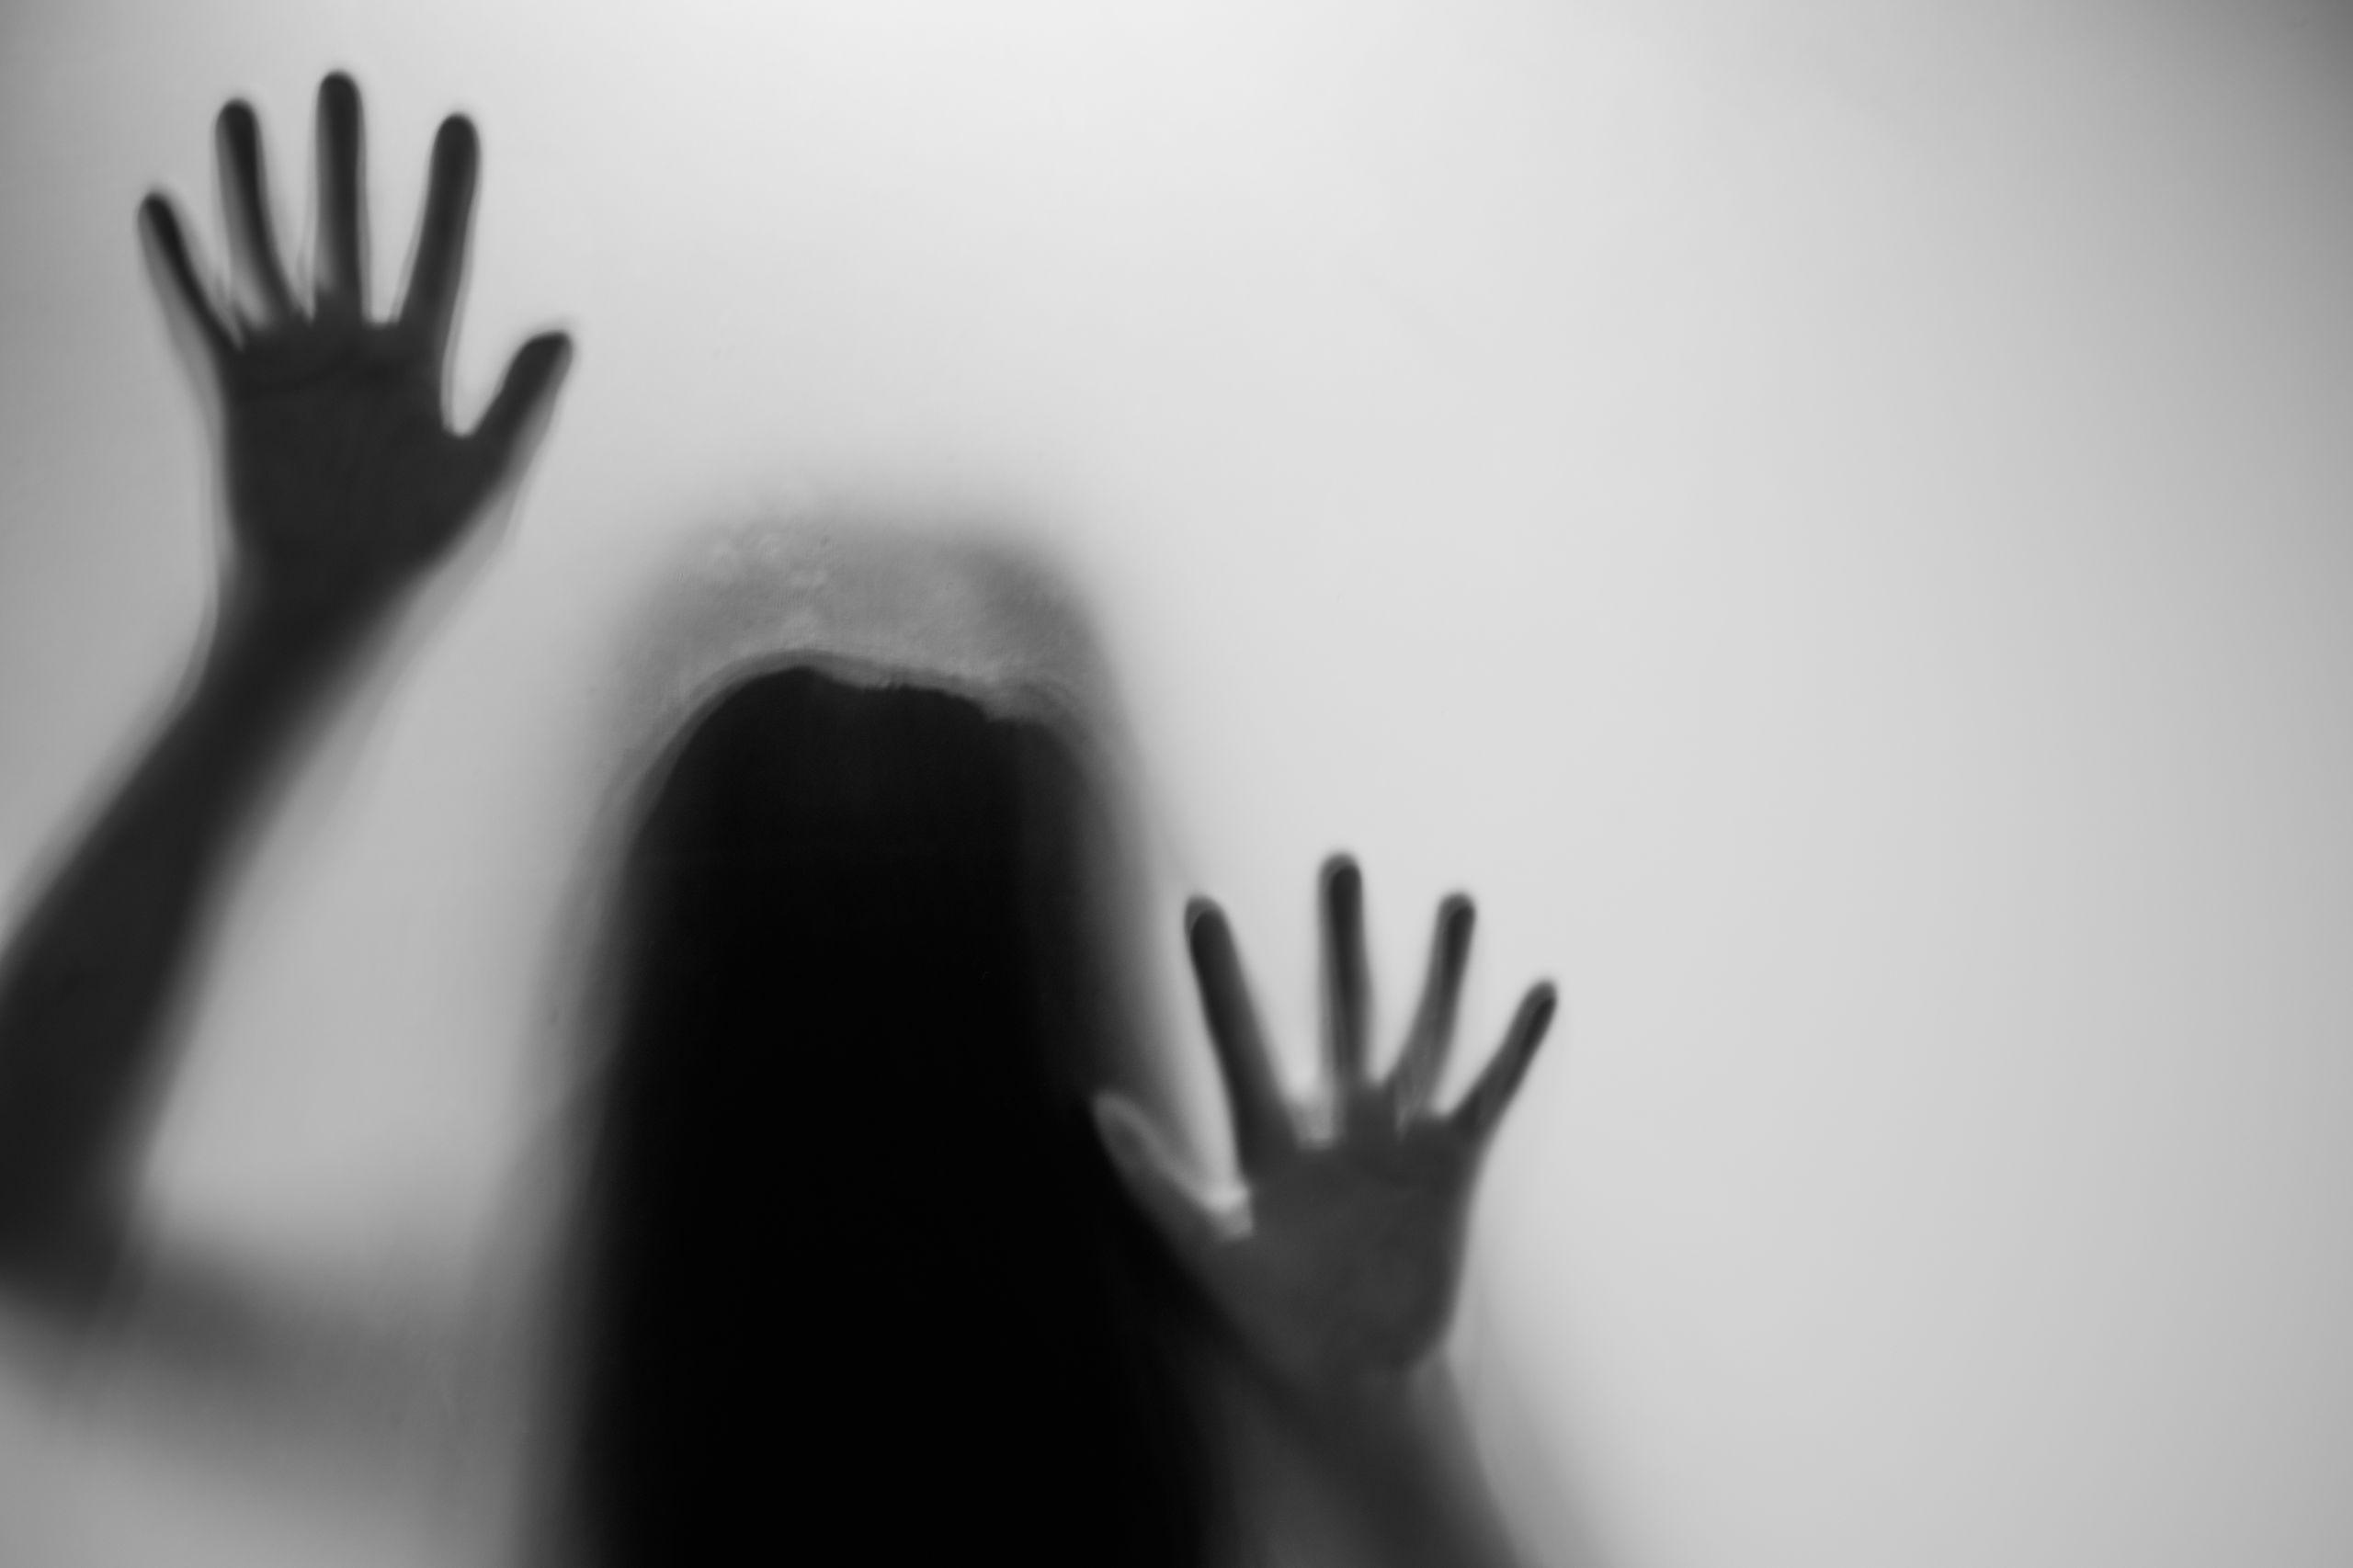 Raped, trafficked, mutilated: Six stories about women